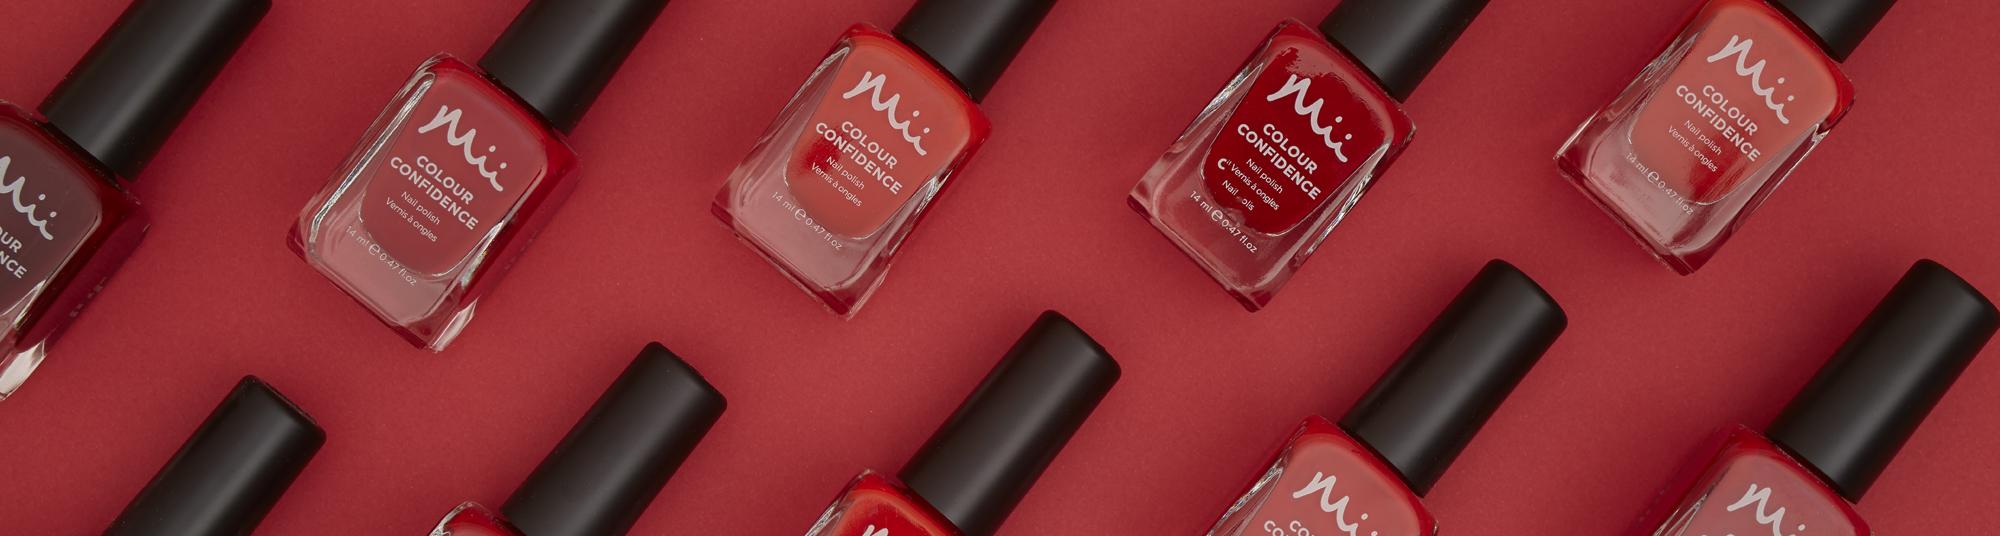 Mii Colour Confidence Nail Polish Red Category